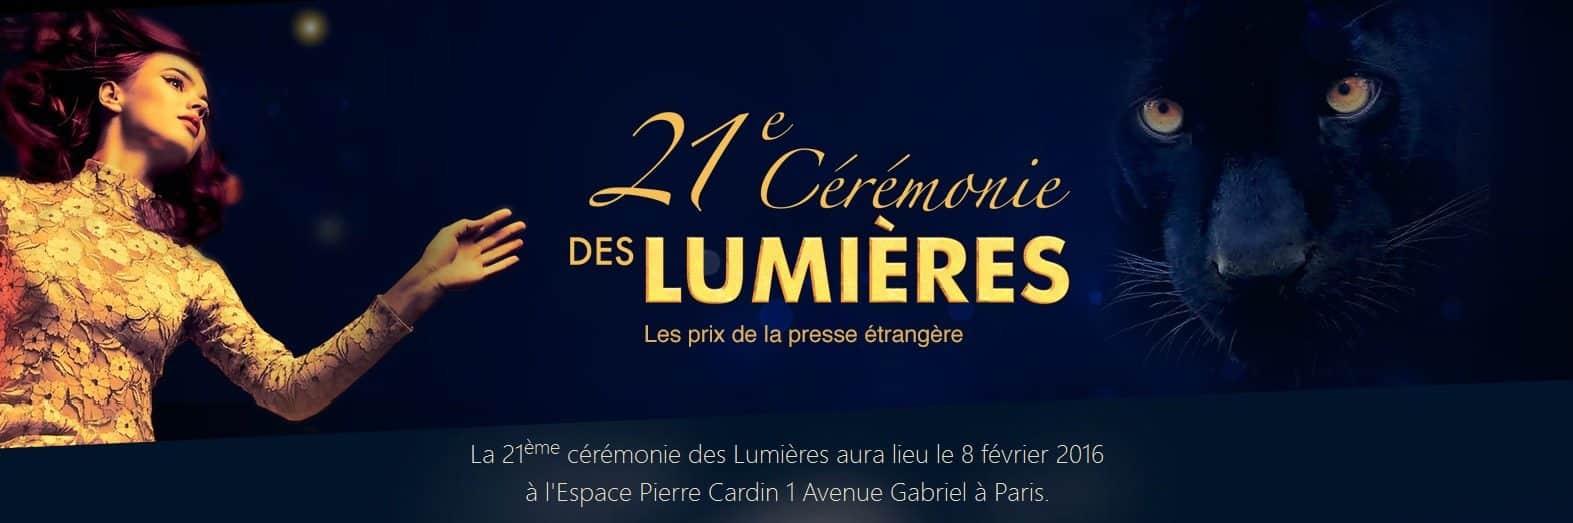 LES LUMIERES 21e